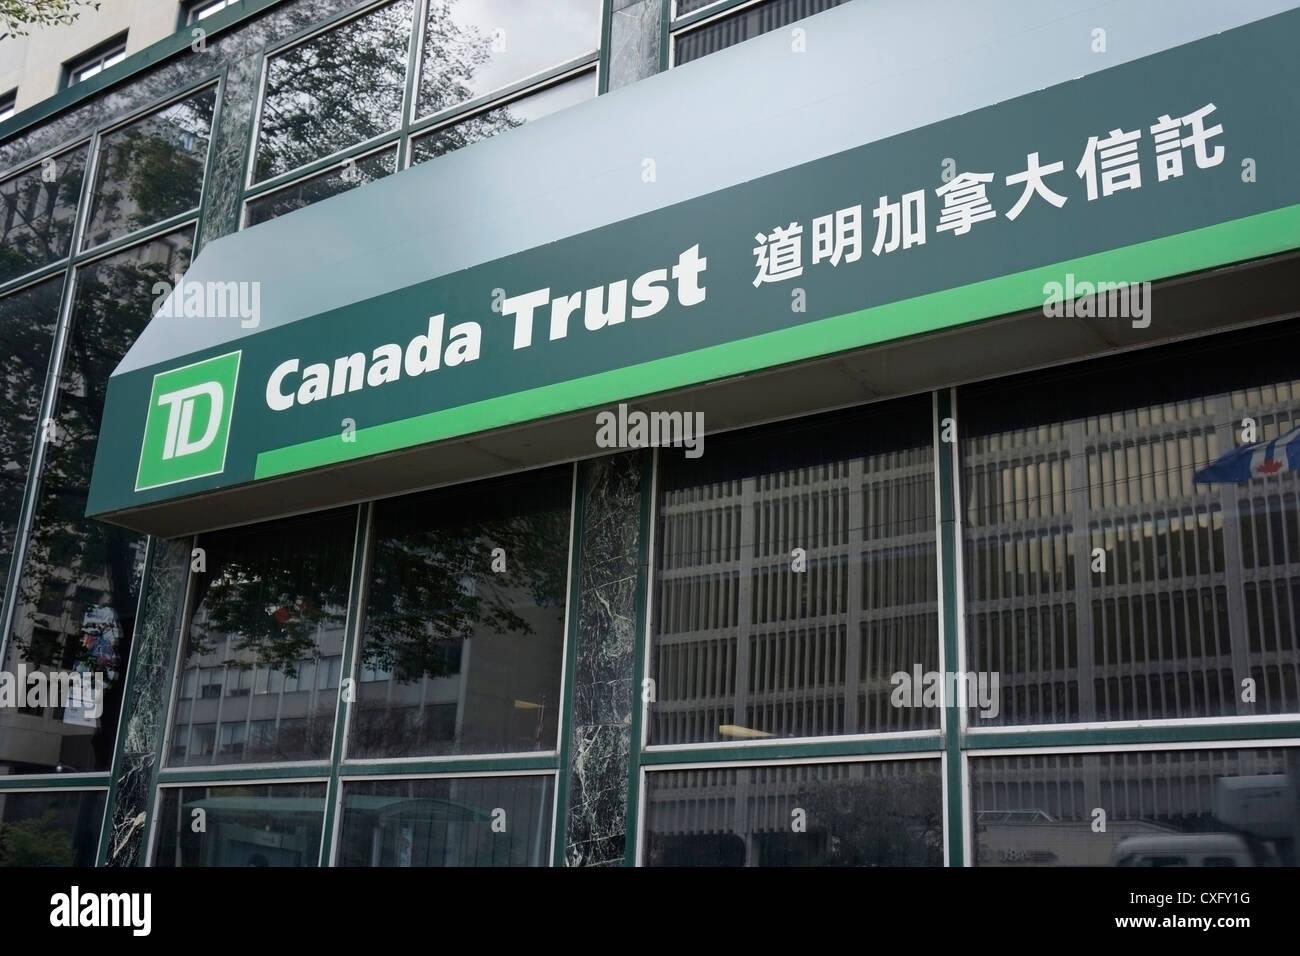 TD Canada Trust, Toronto Stock Photo - Alamy